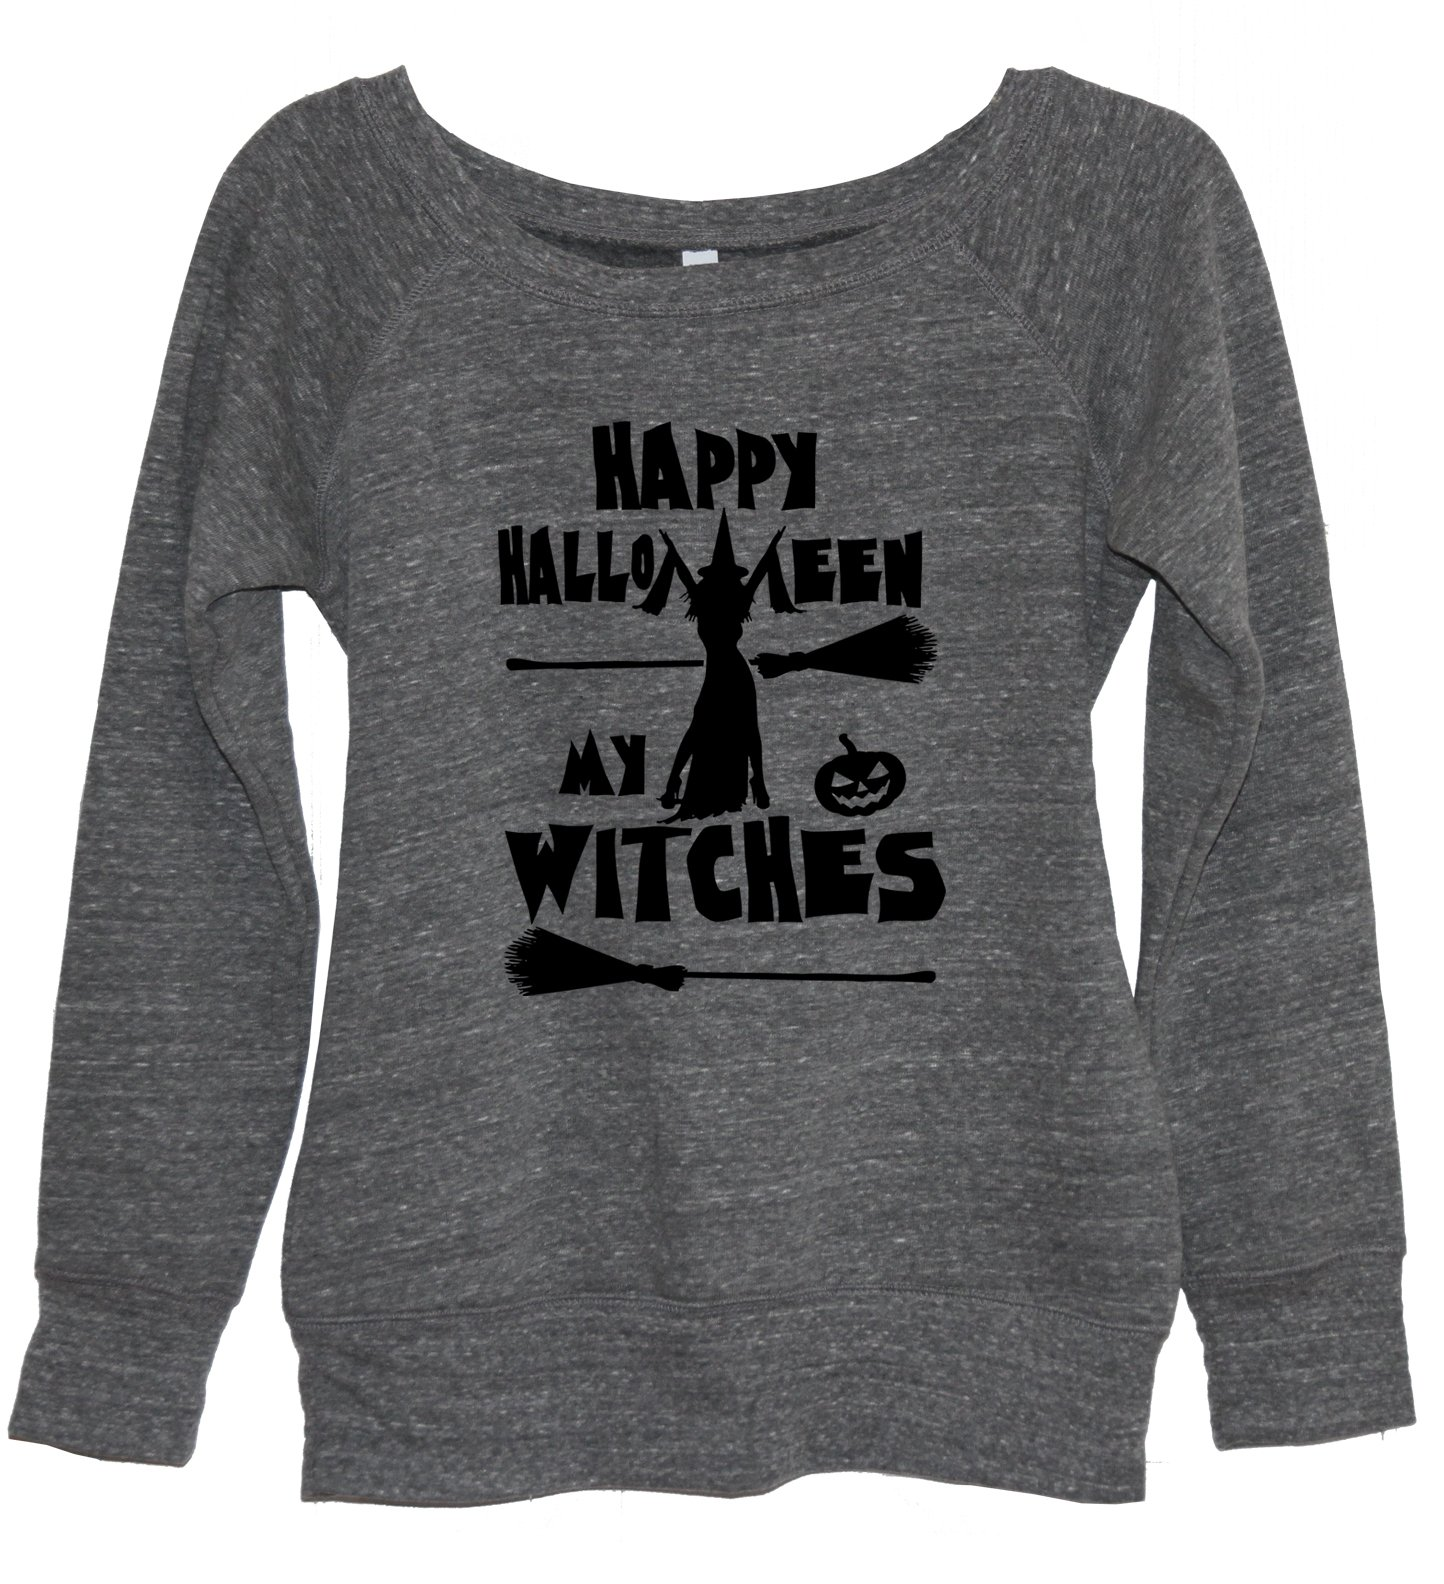 happy halloween my witches sweatshirt halloween hallows eve devils night trick or treat halloween candy halloween costume halloween party halloween